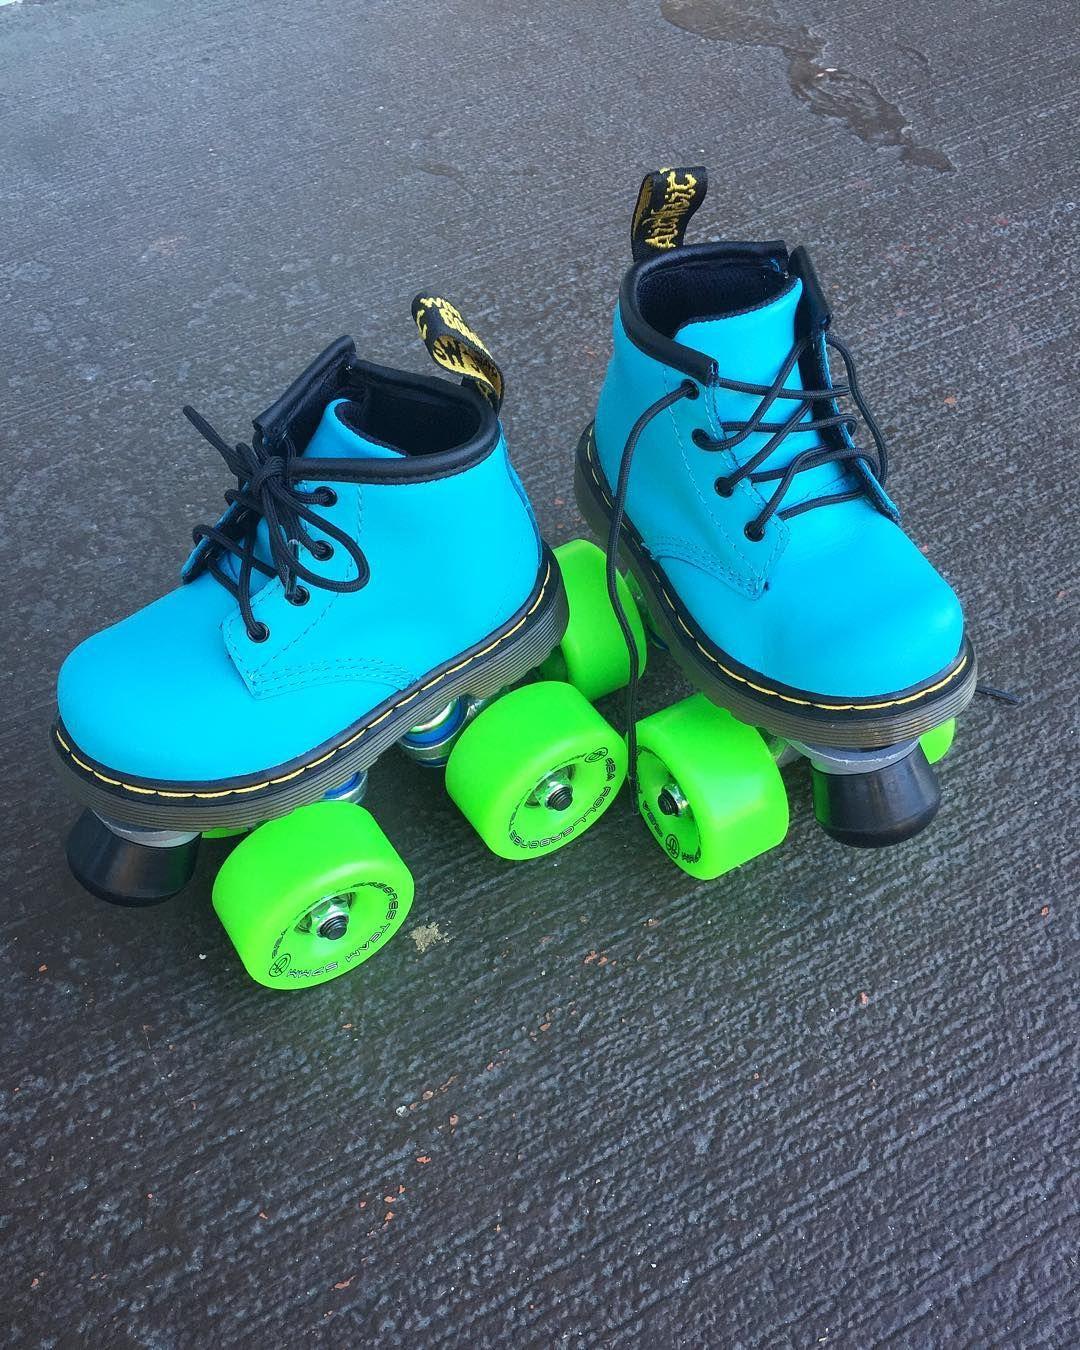 "Roller Skate Shop on Instagram: ""So"